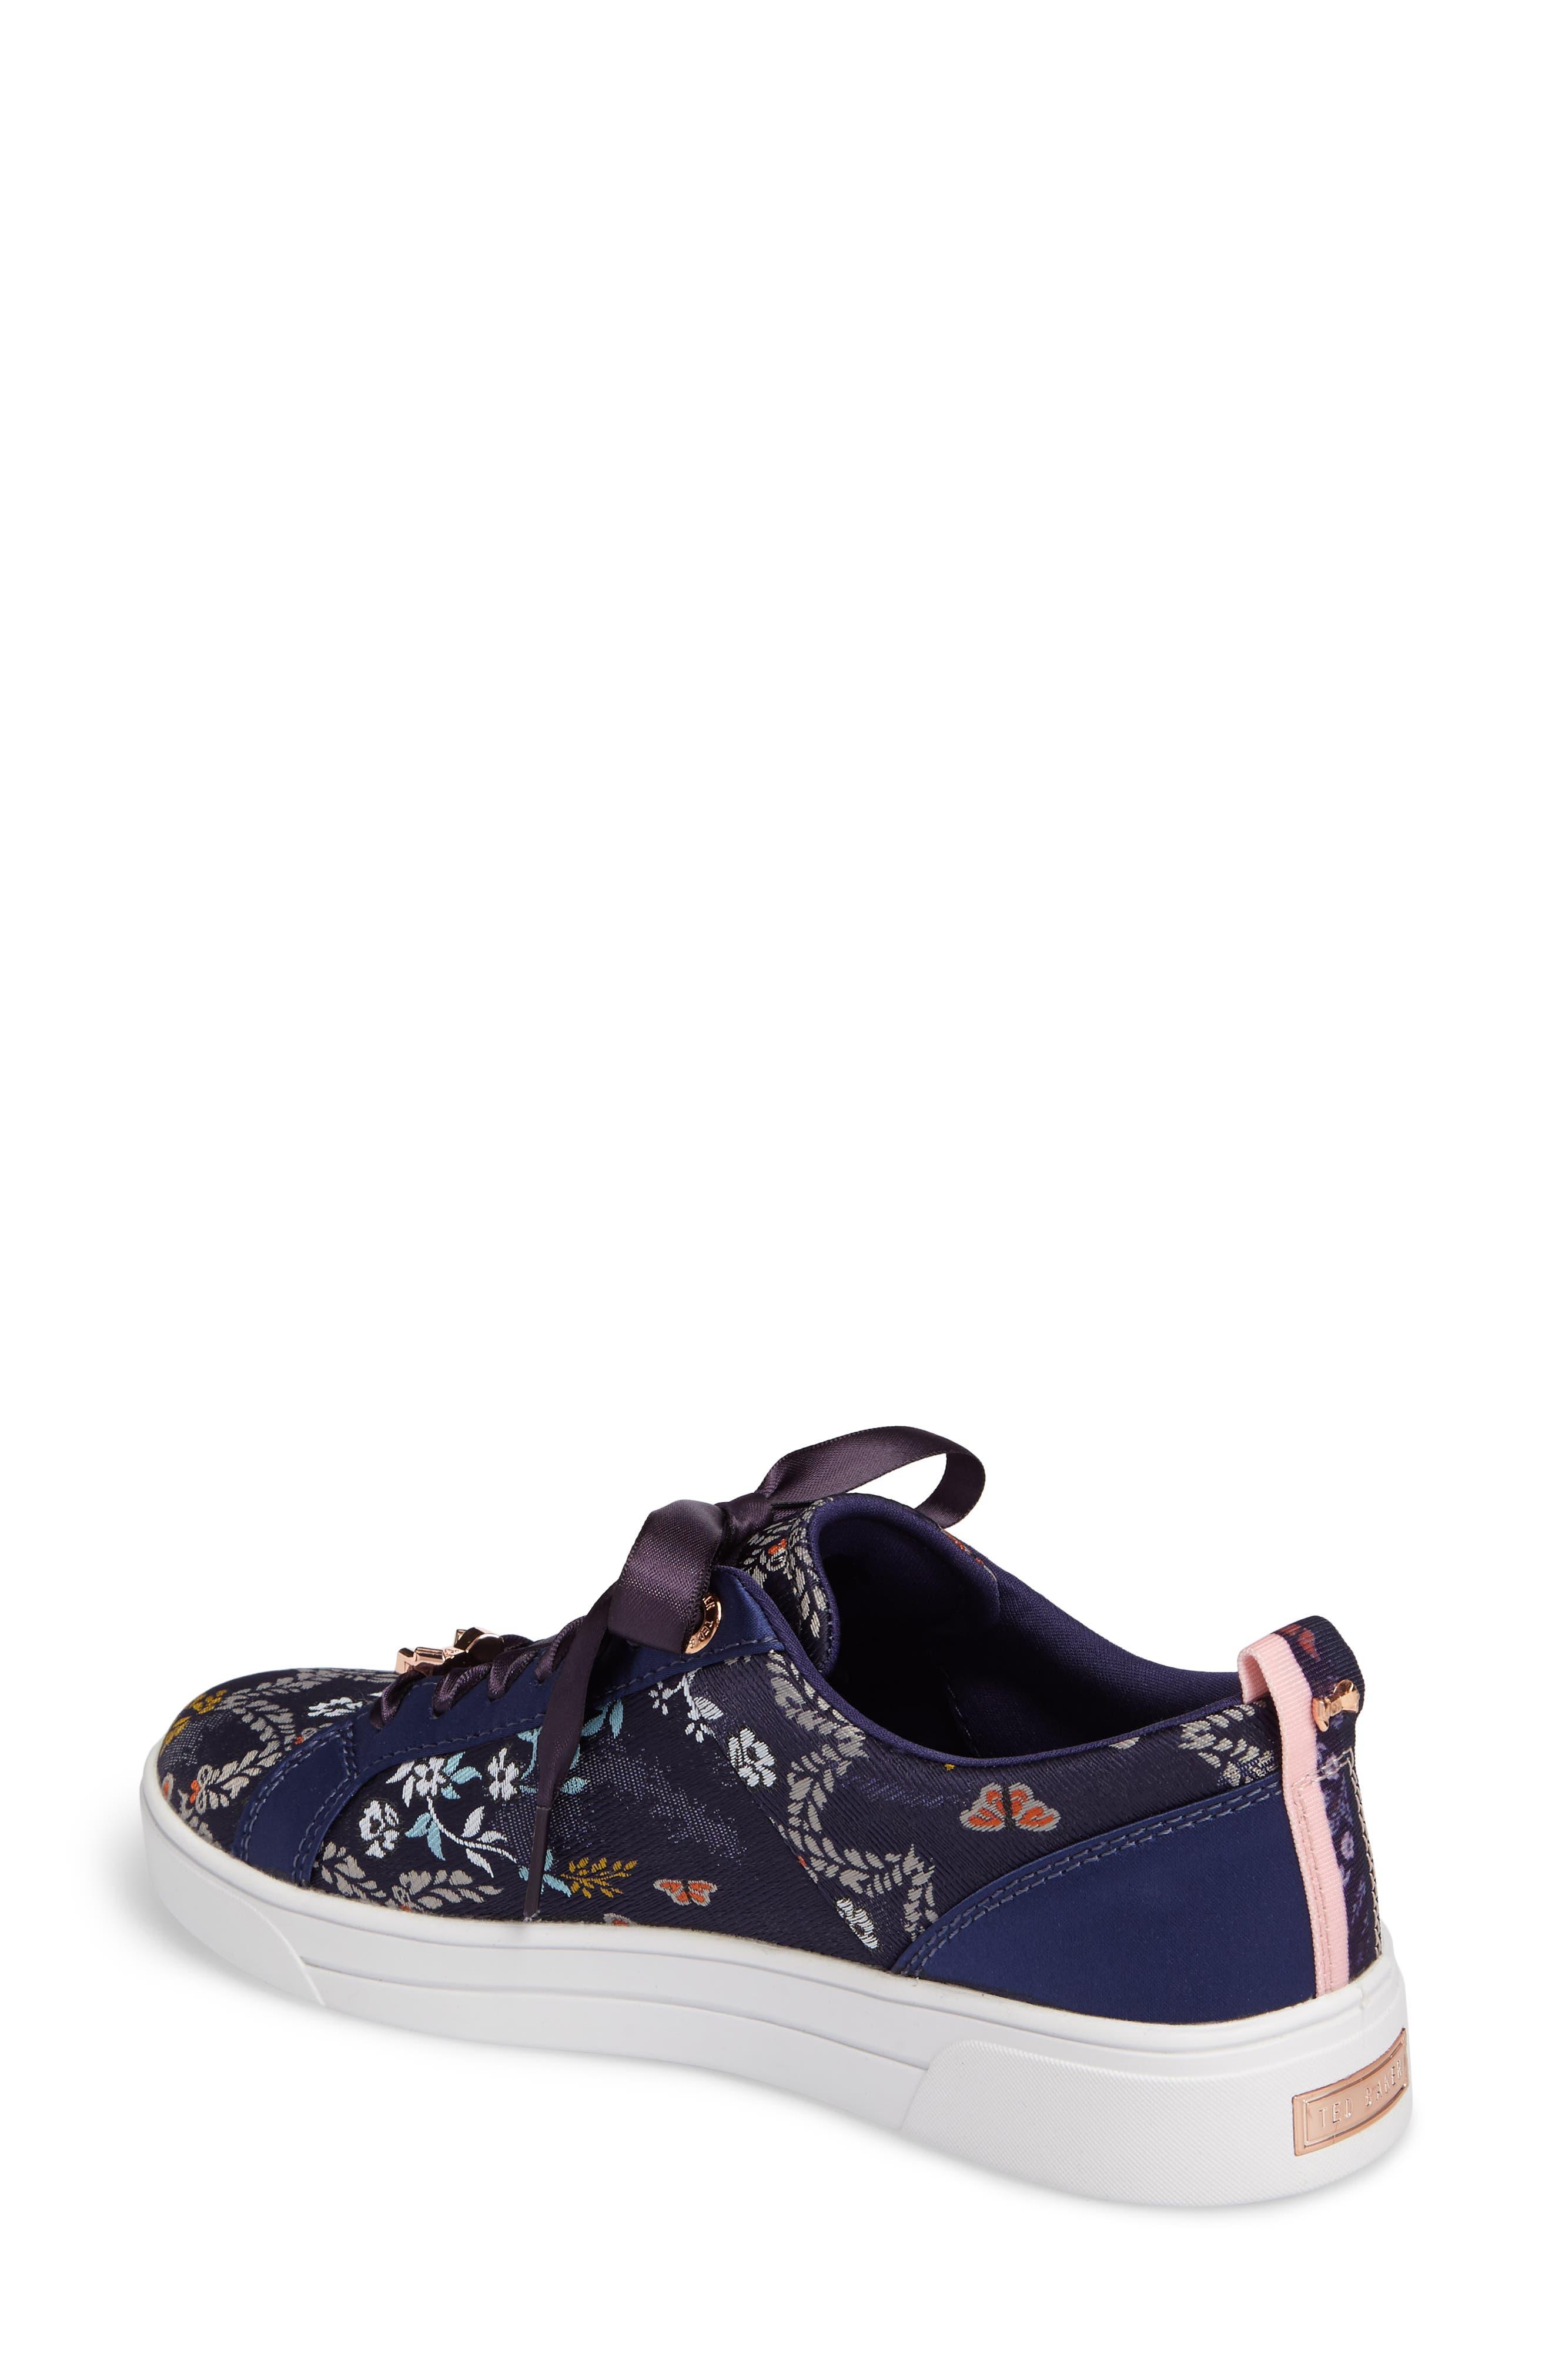 Alternate Image 2  - Ted Baker London Sorcey Platform Sneaker (Women)